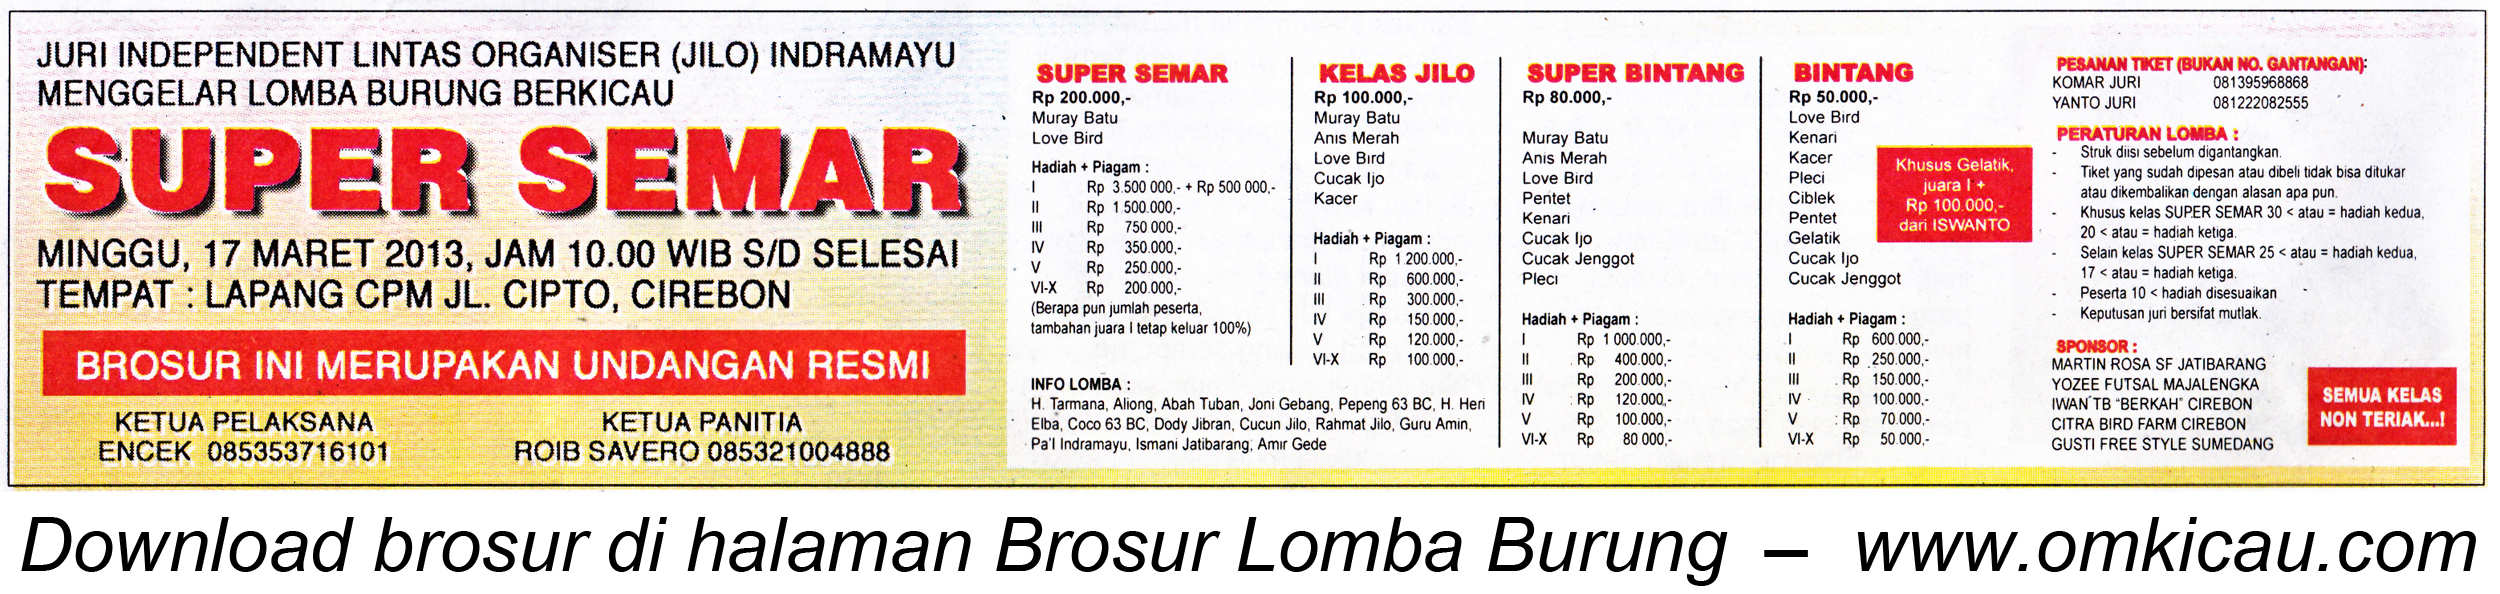 Brosur Lomba Burung Super Semar Cirebon